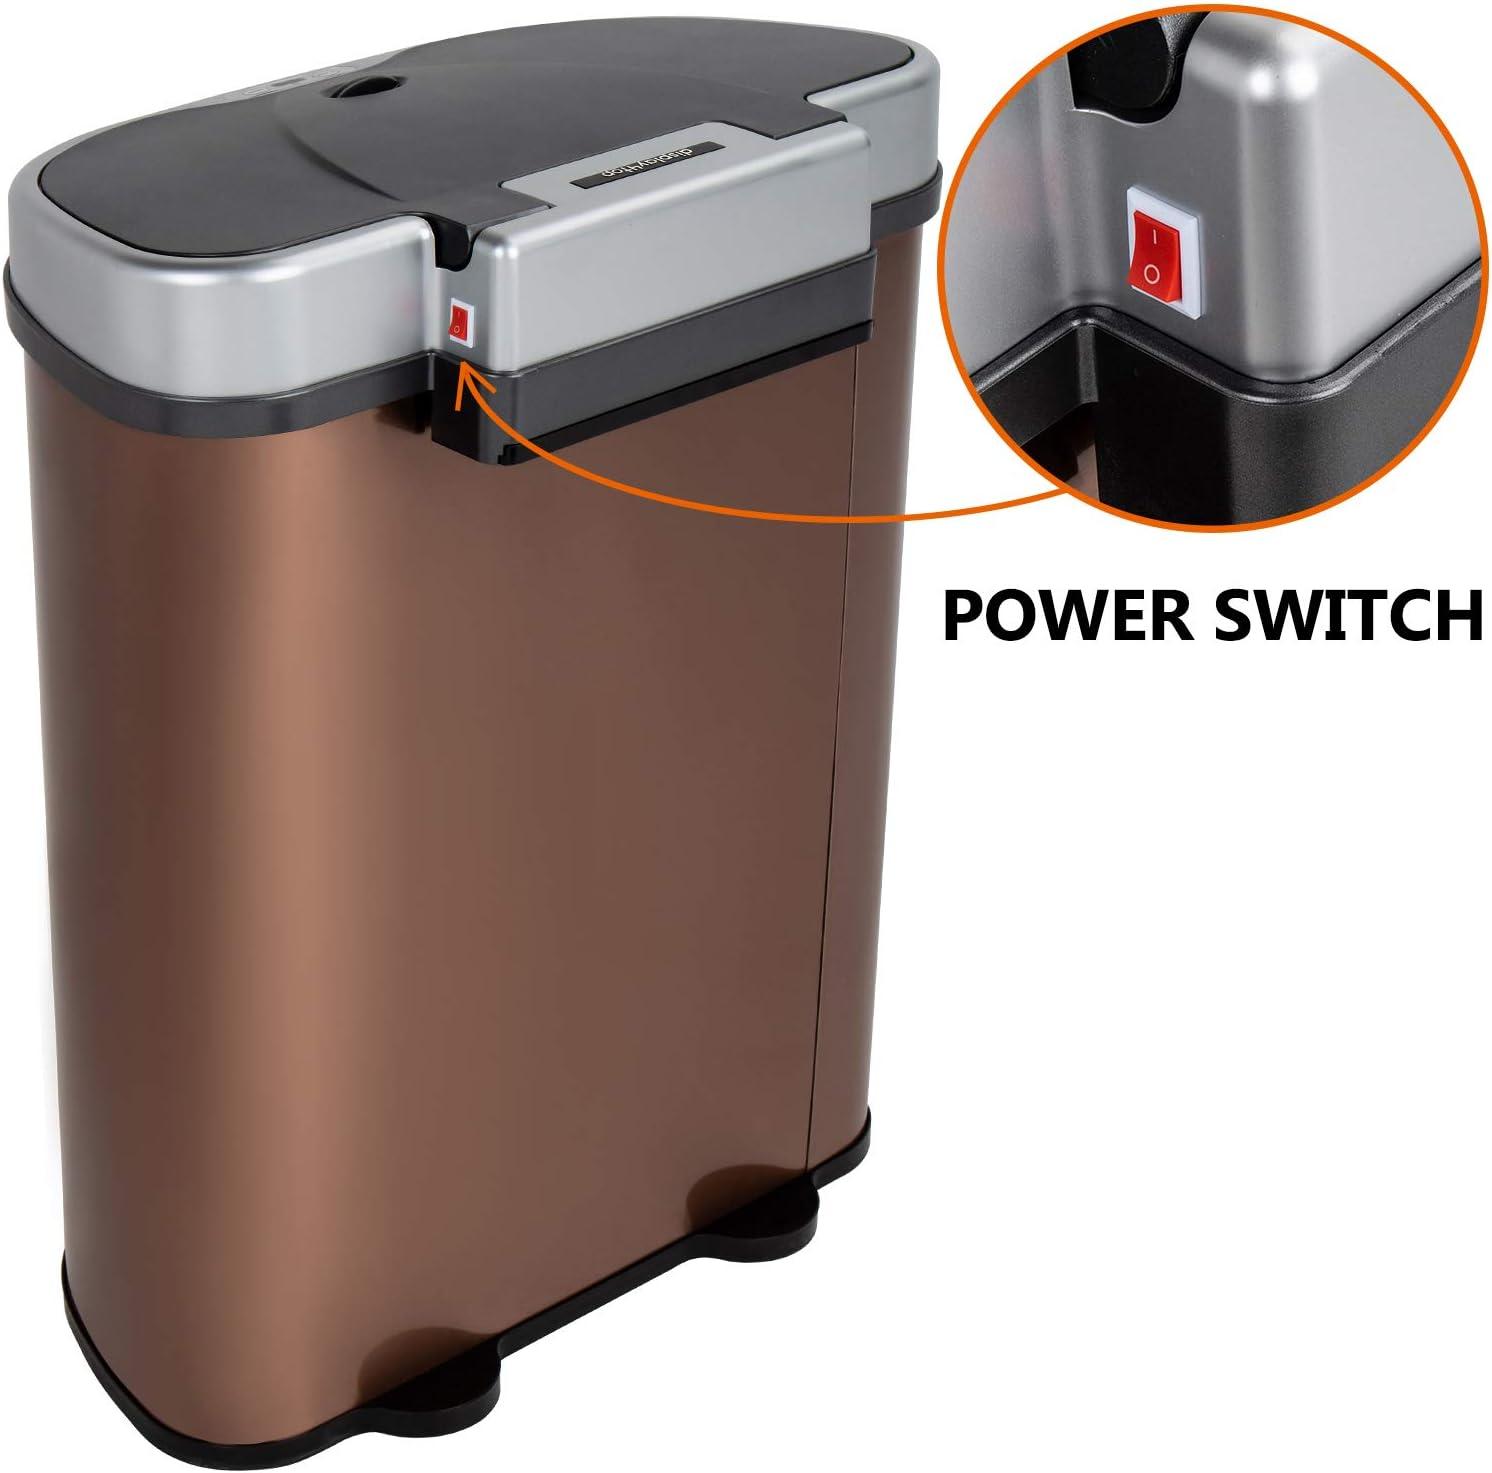 K/ücheneimer mit M/ülltrennung 2 F/ächer FOBUY D4P Display4top Sensor M/ülleimer 70 Liter,Hochwertiger Edelstahl Automatik Abfalleimer